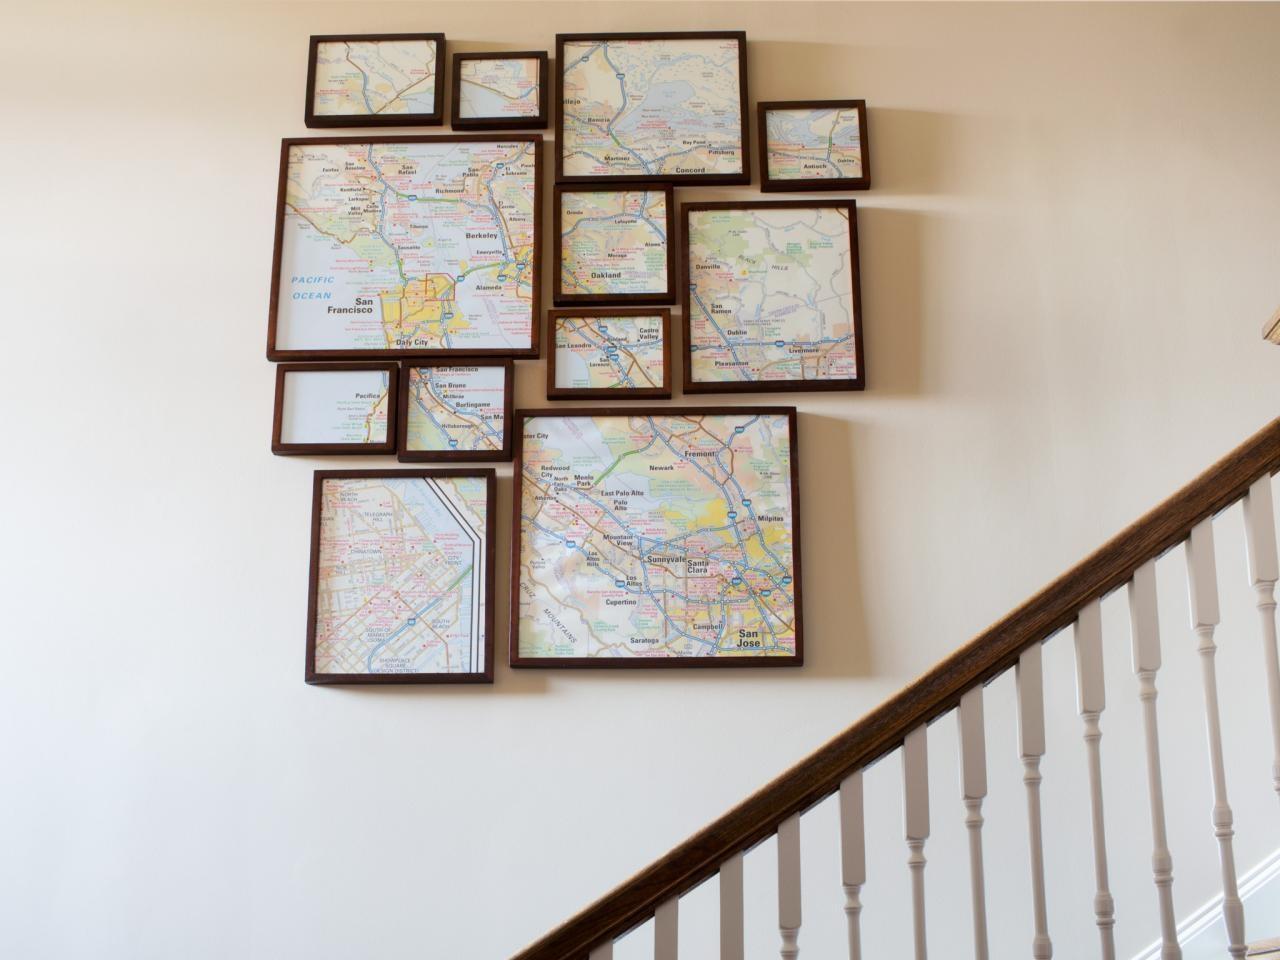 How To Create Fractured, Framed Map Art | Hgtv Regarding Framed World Map Wall Art (Image 7 of 20)